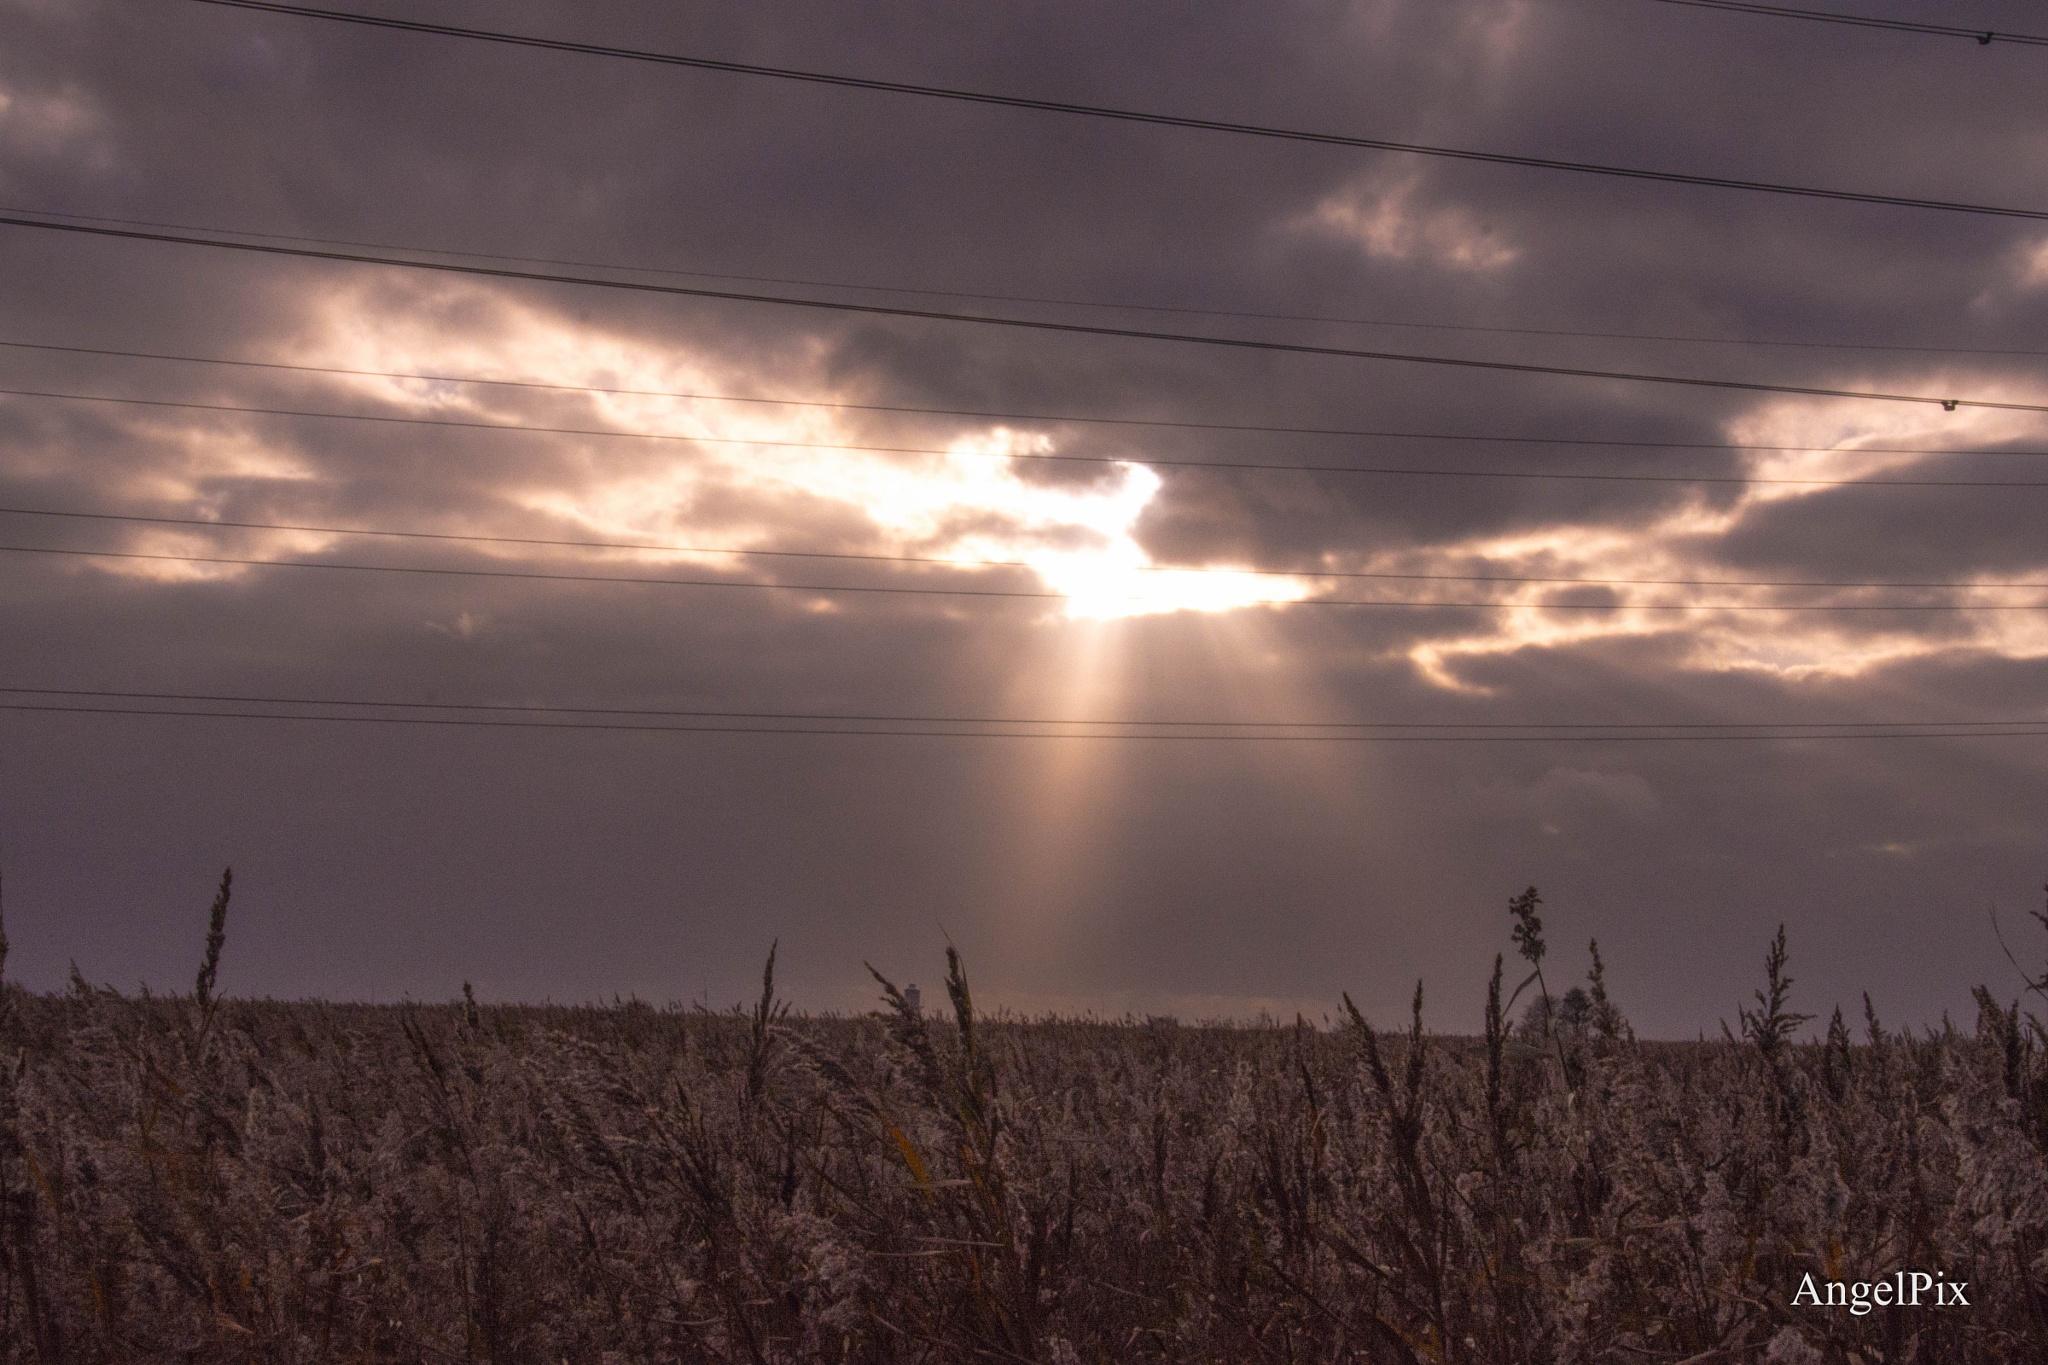 The Heavens peep by AngelPixCN